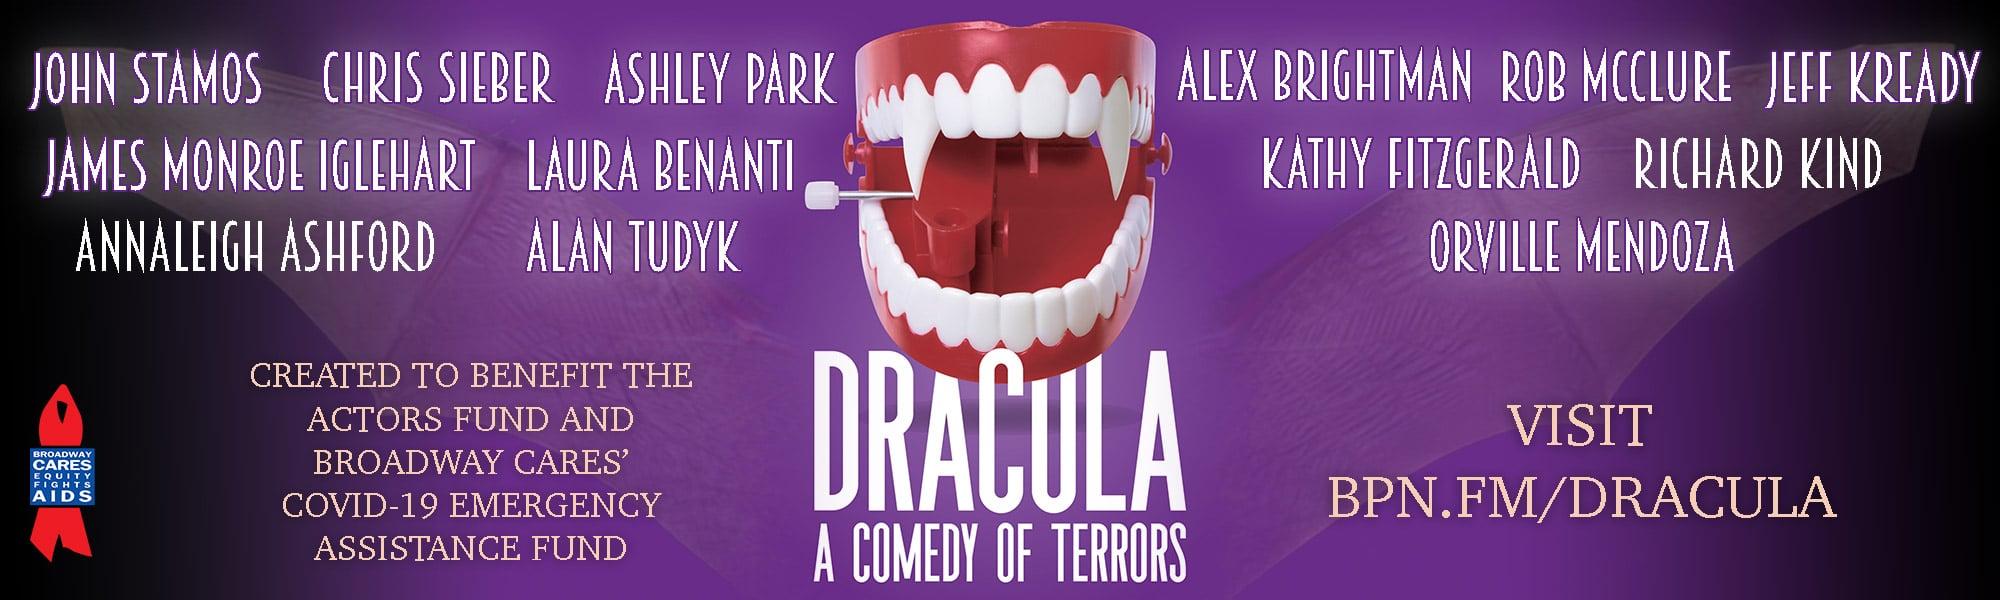 Dracula banner - full cast